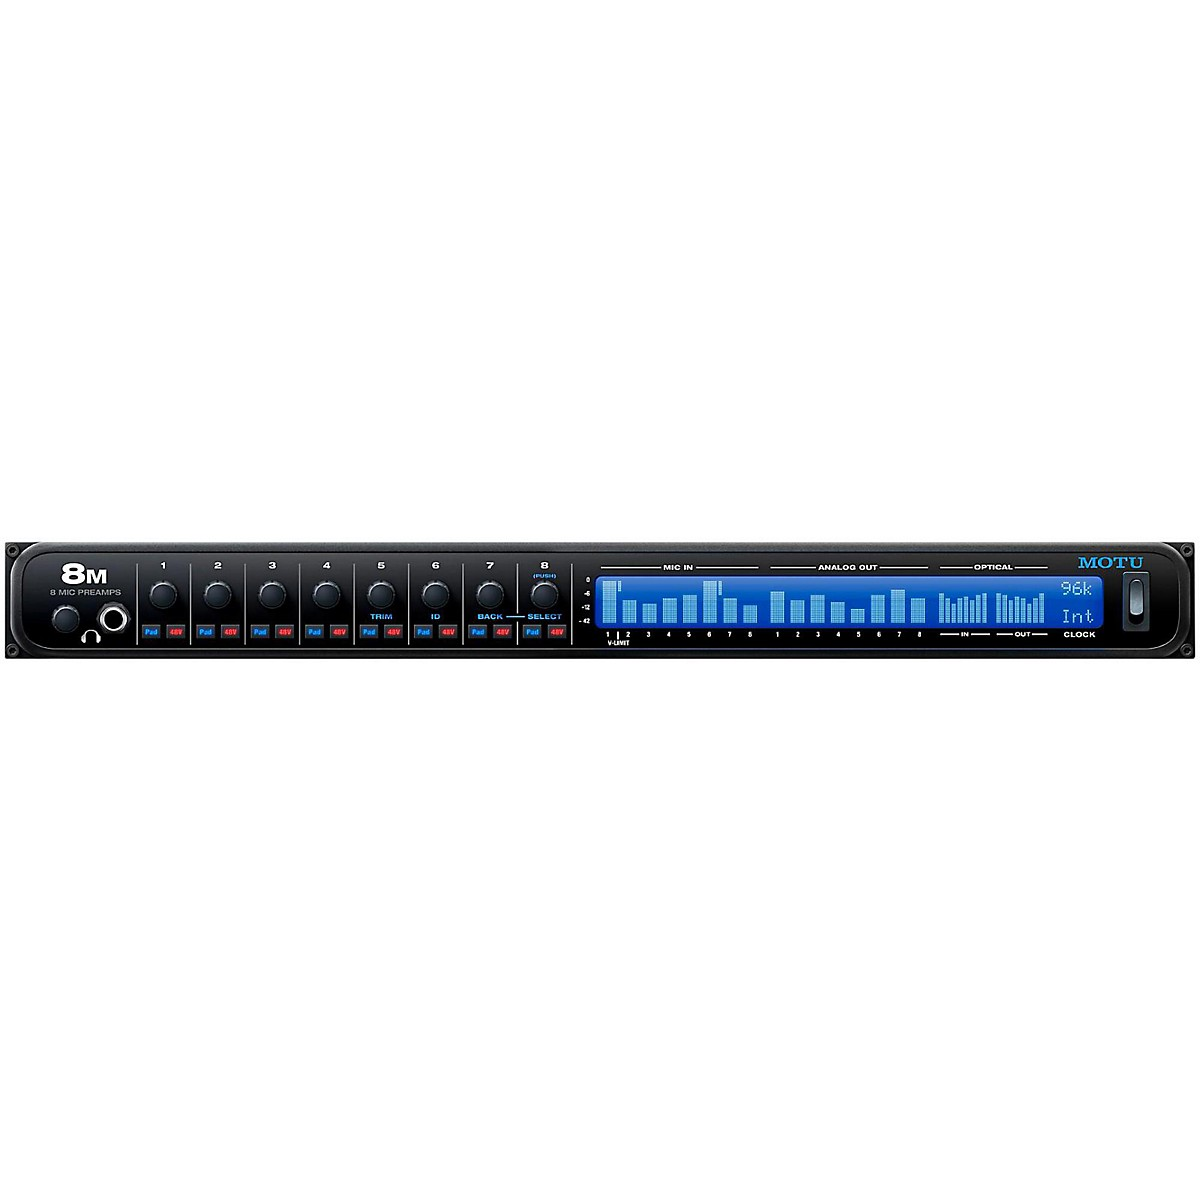 MOTU 8M Thunderbolt Audio Interface